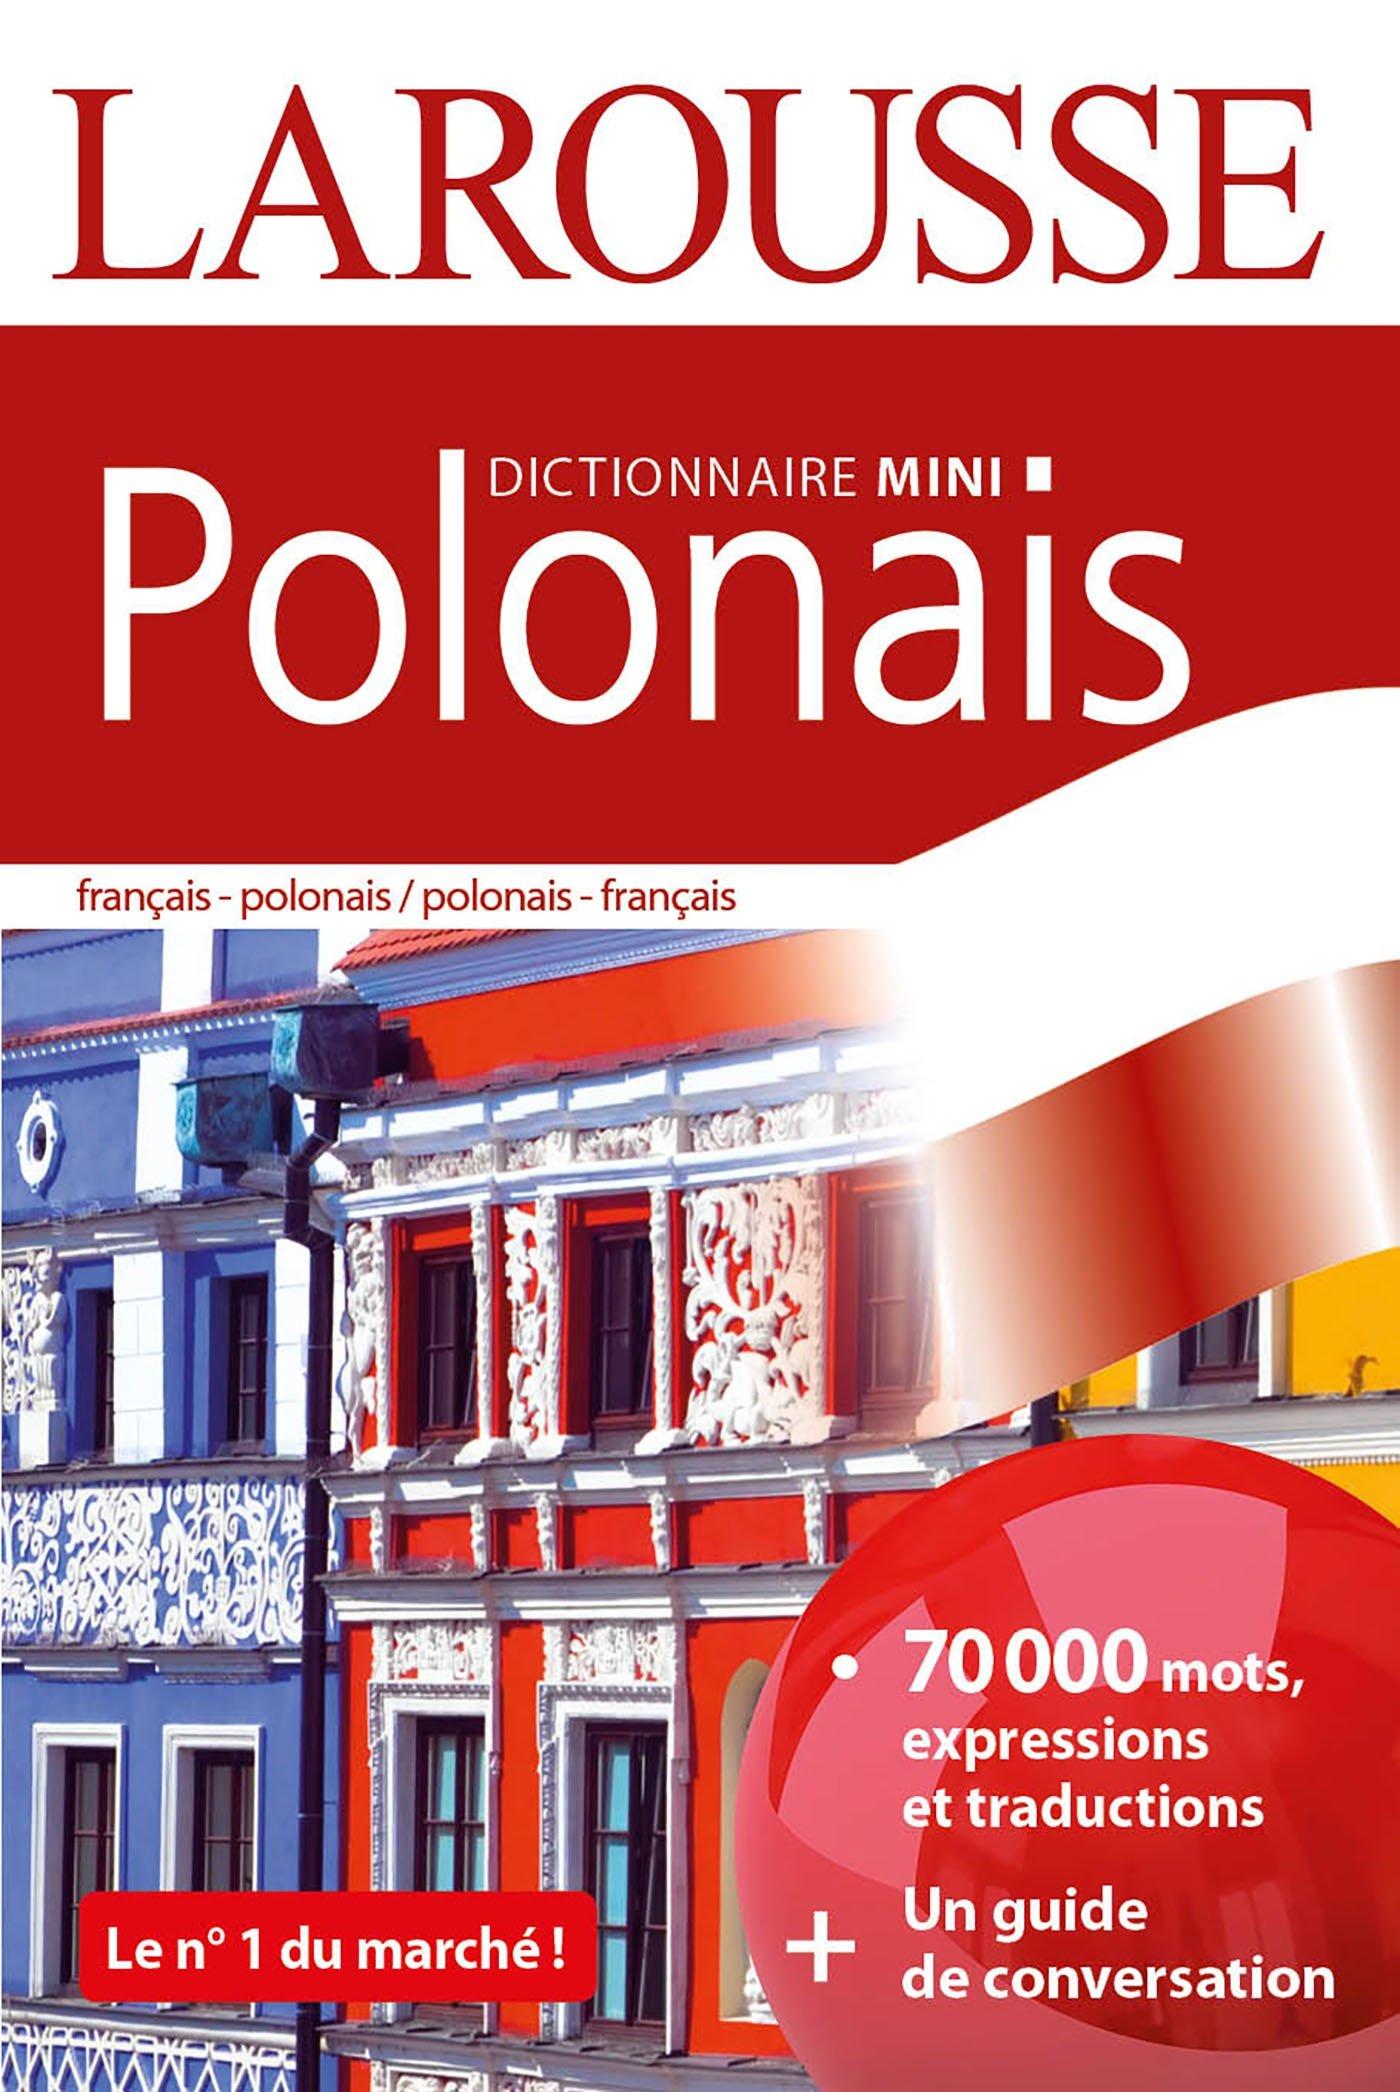 Mini słownik francusko-polski, polsko-francuski